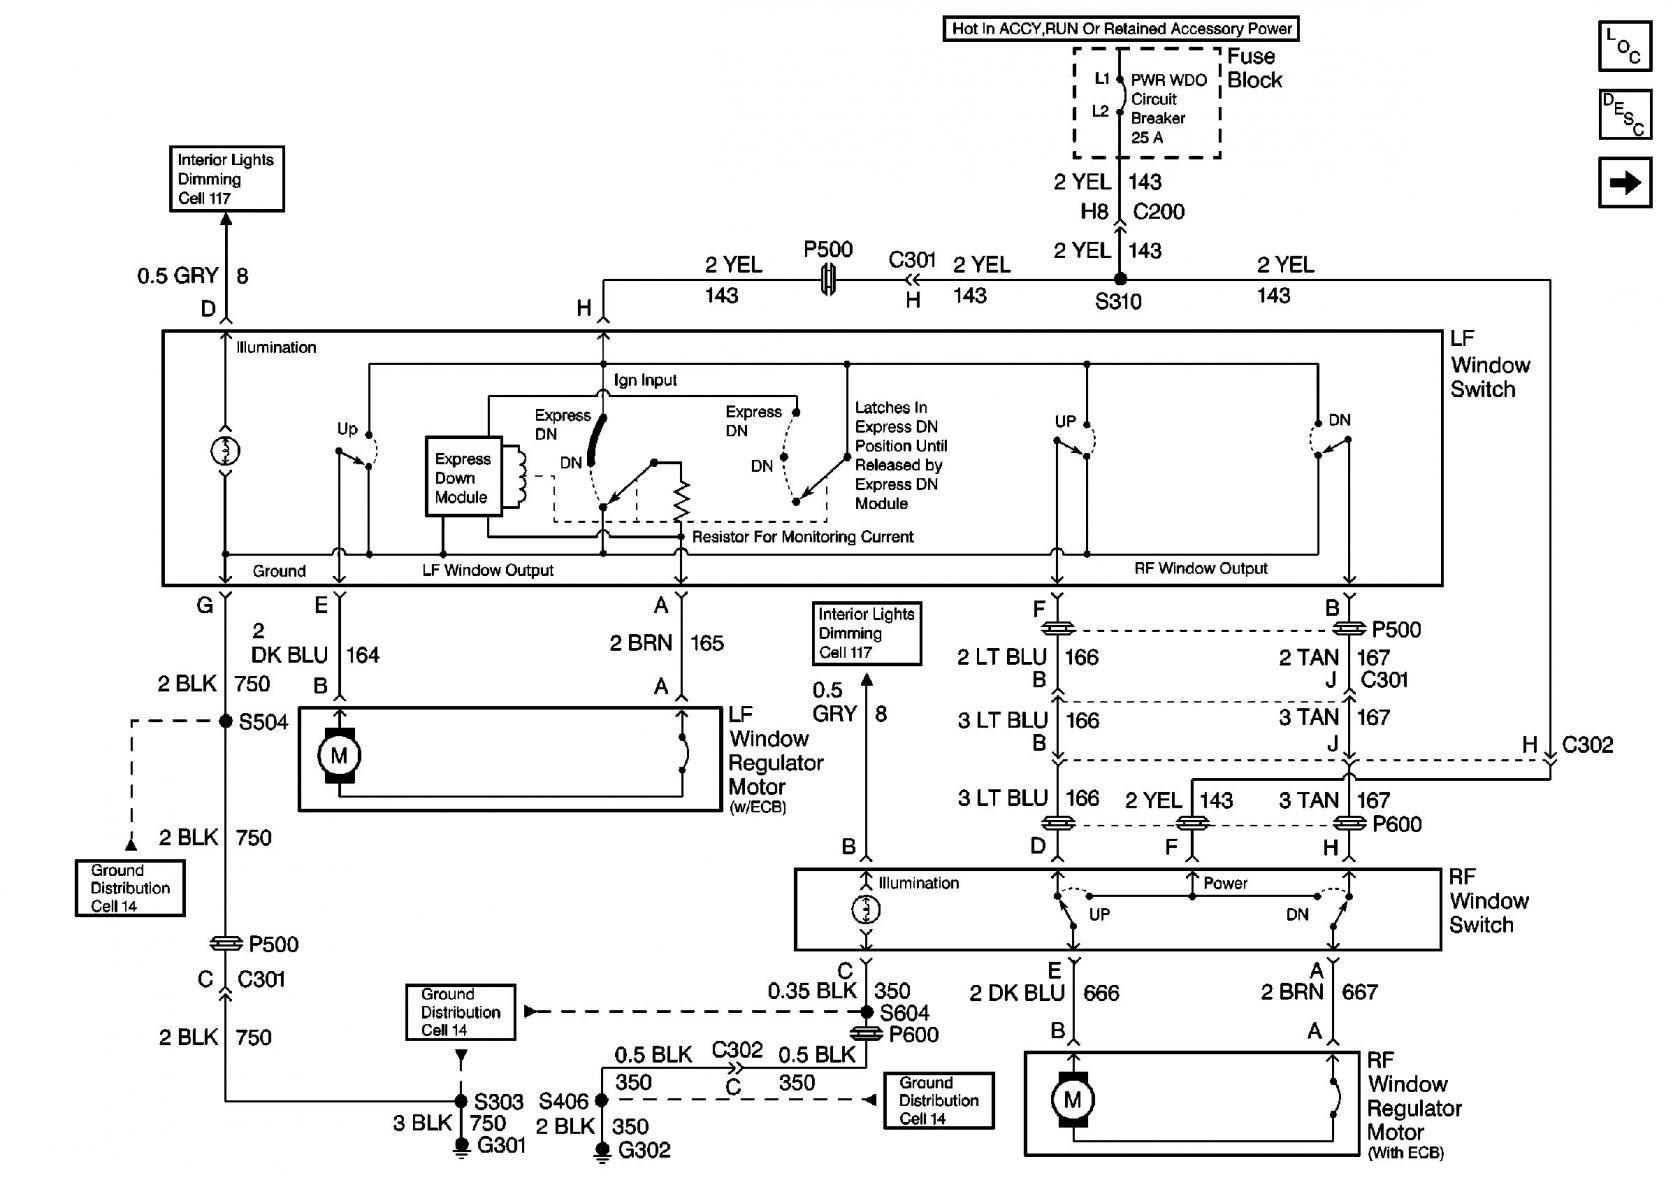 hight resolution of subaru outback engine diagram subaru 2 5 engine diagram addition 1995 subaru legacy engine diagram 2000